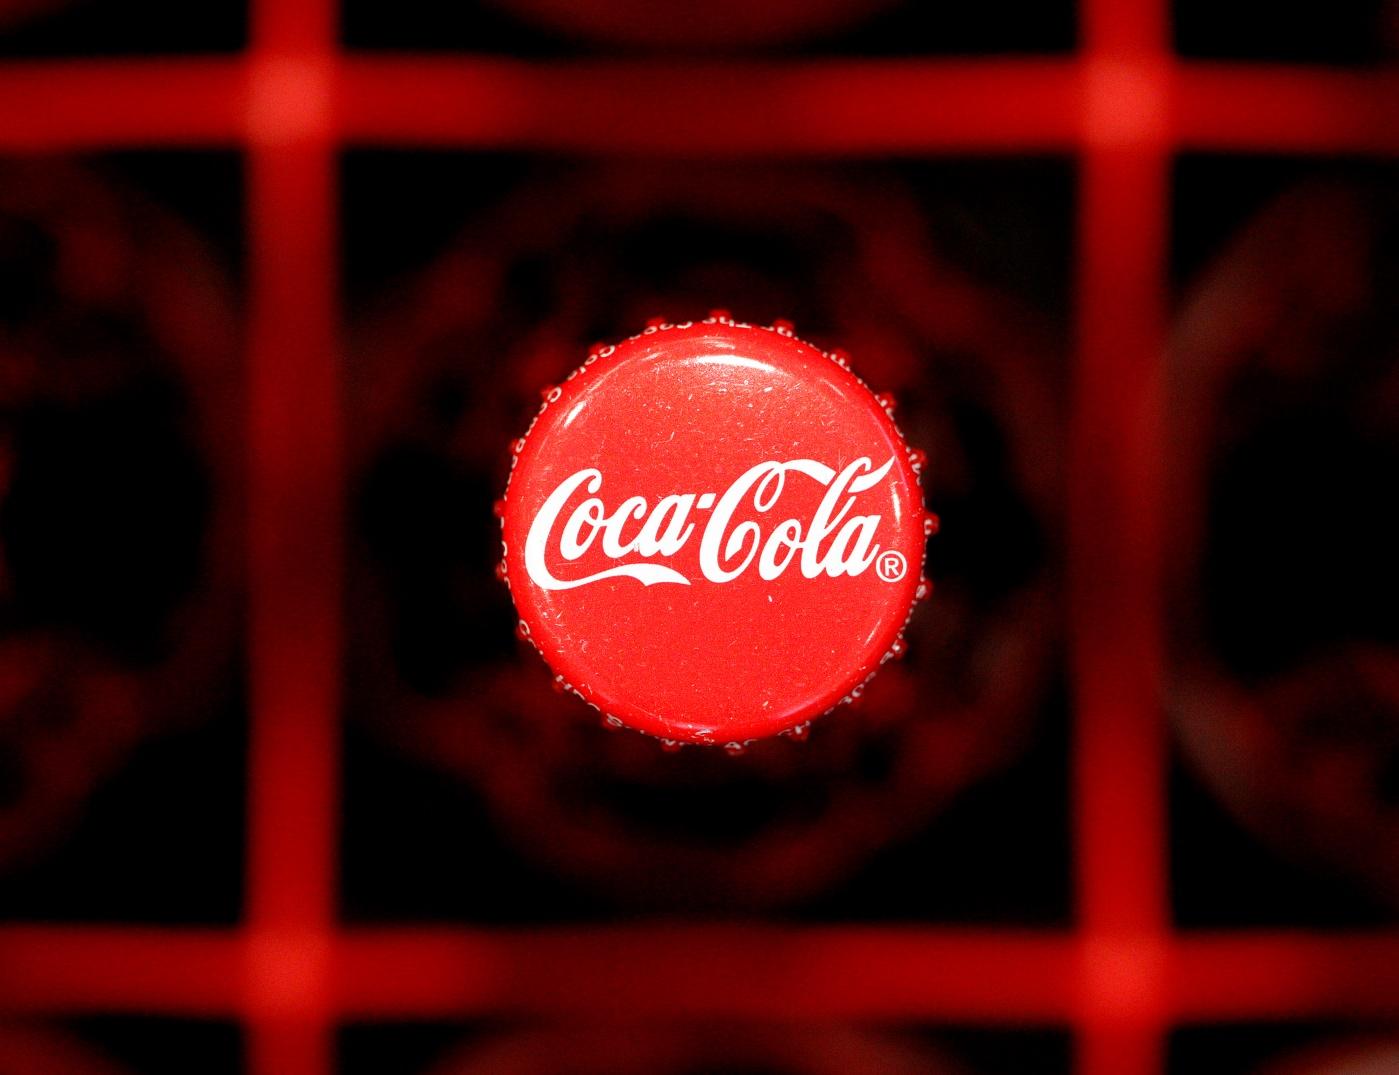 S&P: Υποβάθμισε το outlook της Coca Cola ΗBC σε σταθερό